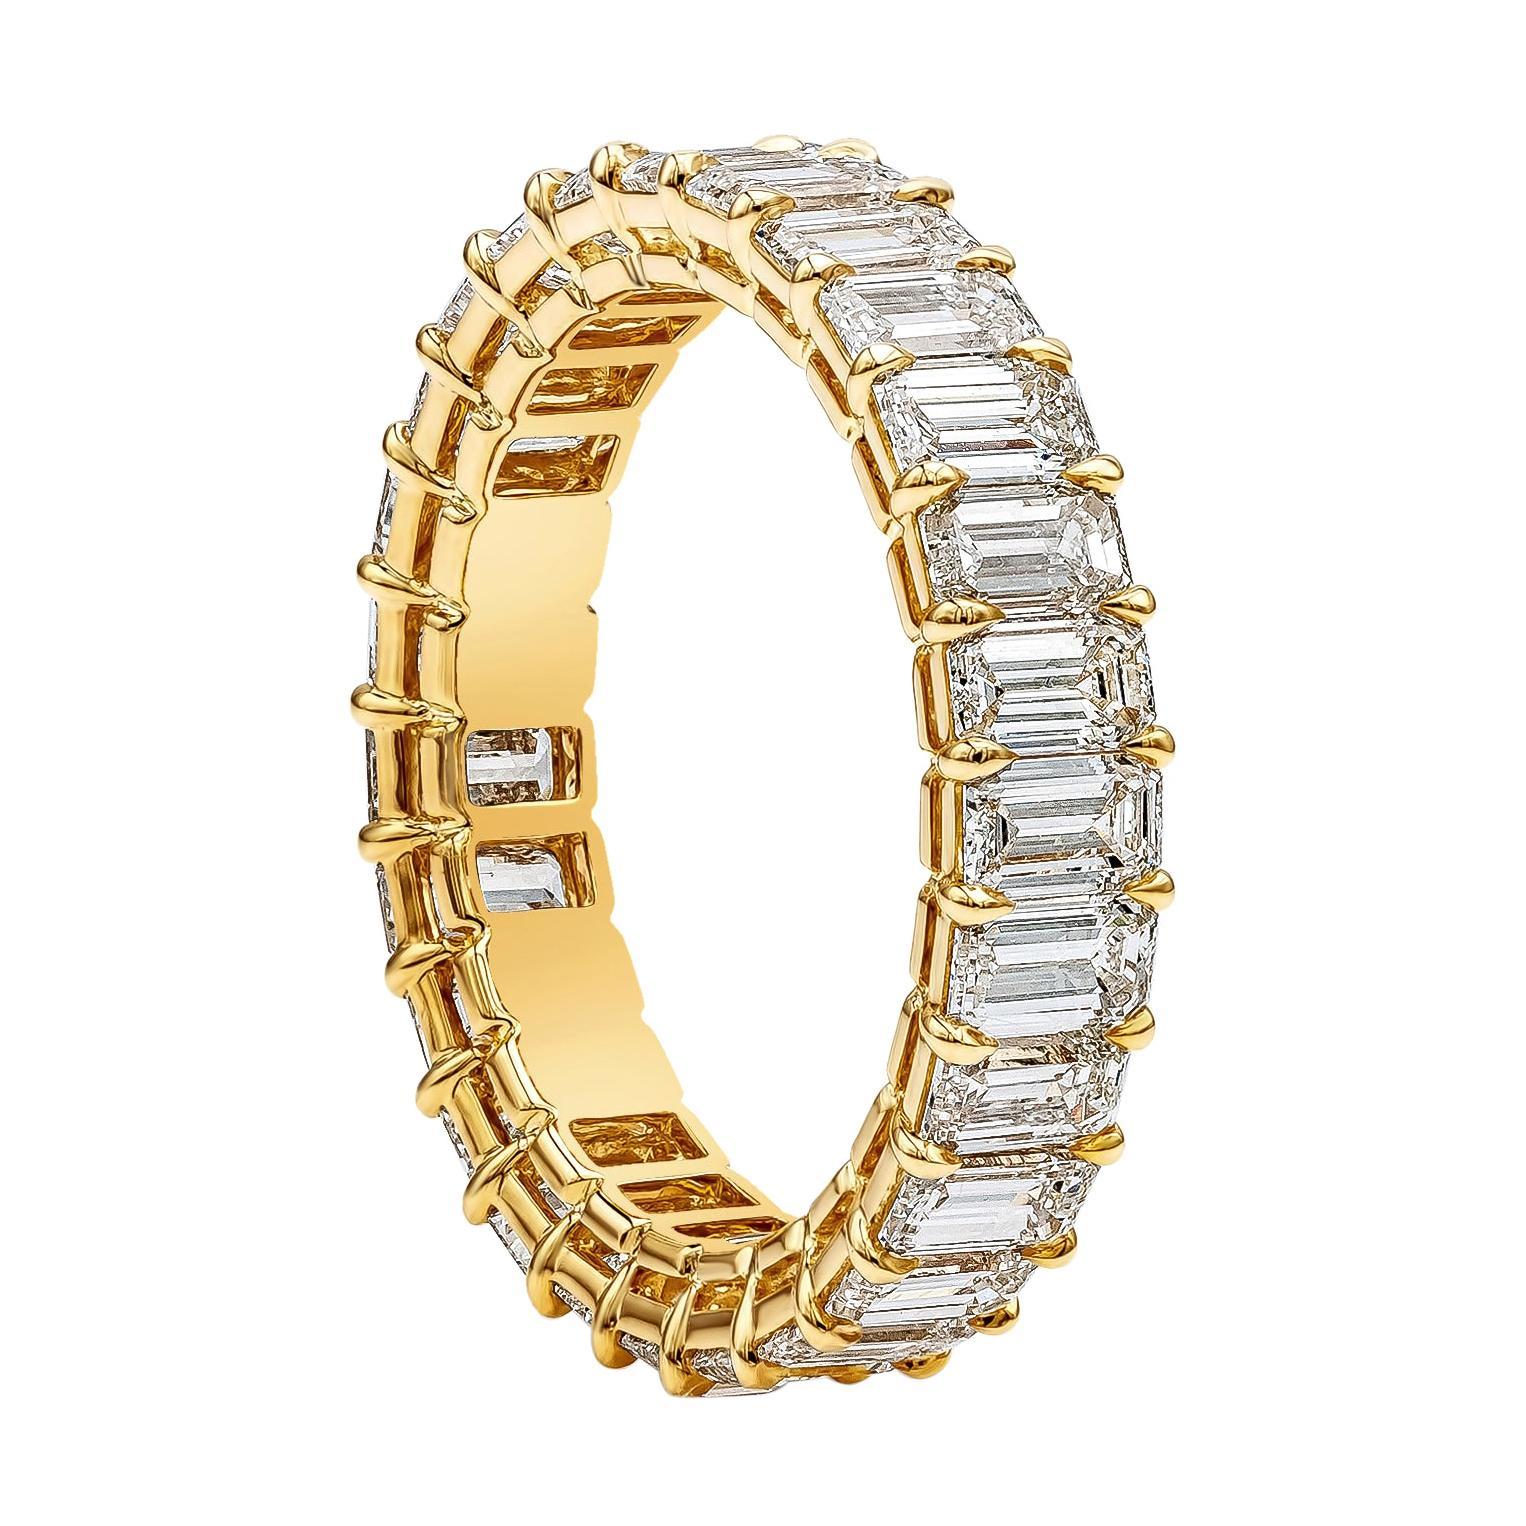 Emerald Cut Diamond Eternity Wedding Band, 4.12 Carats